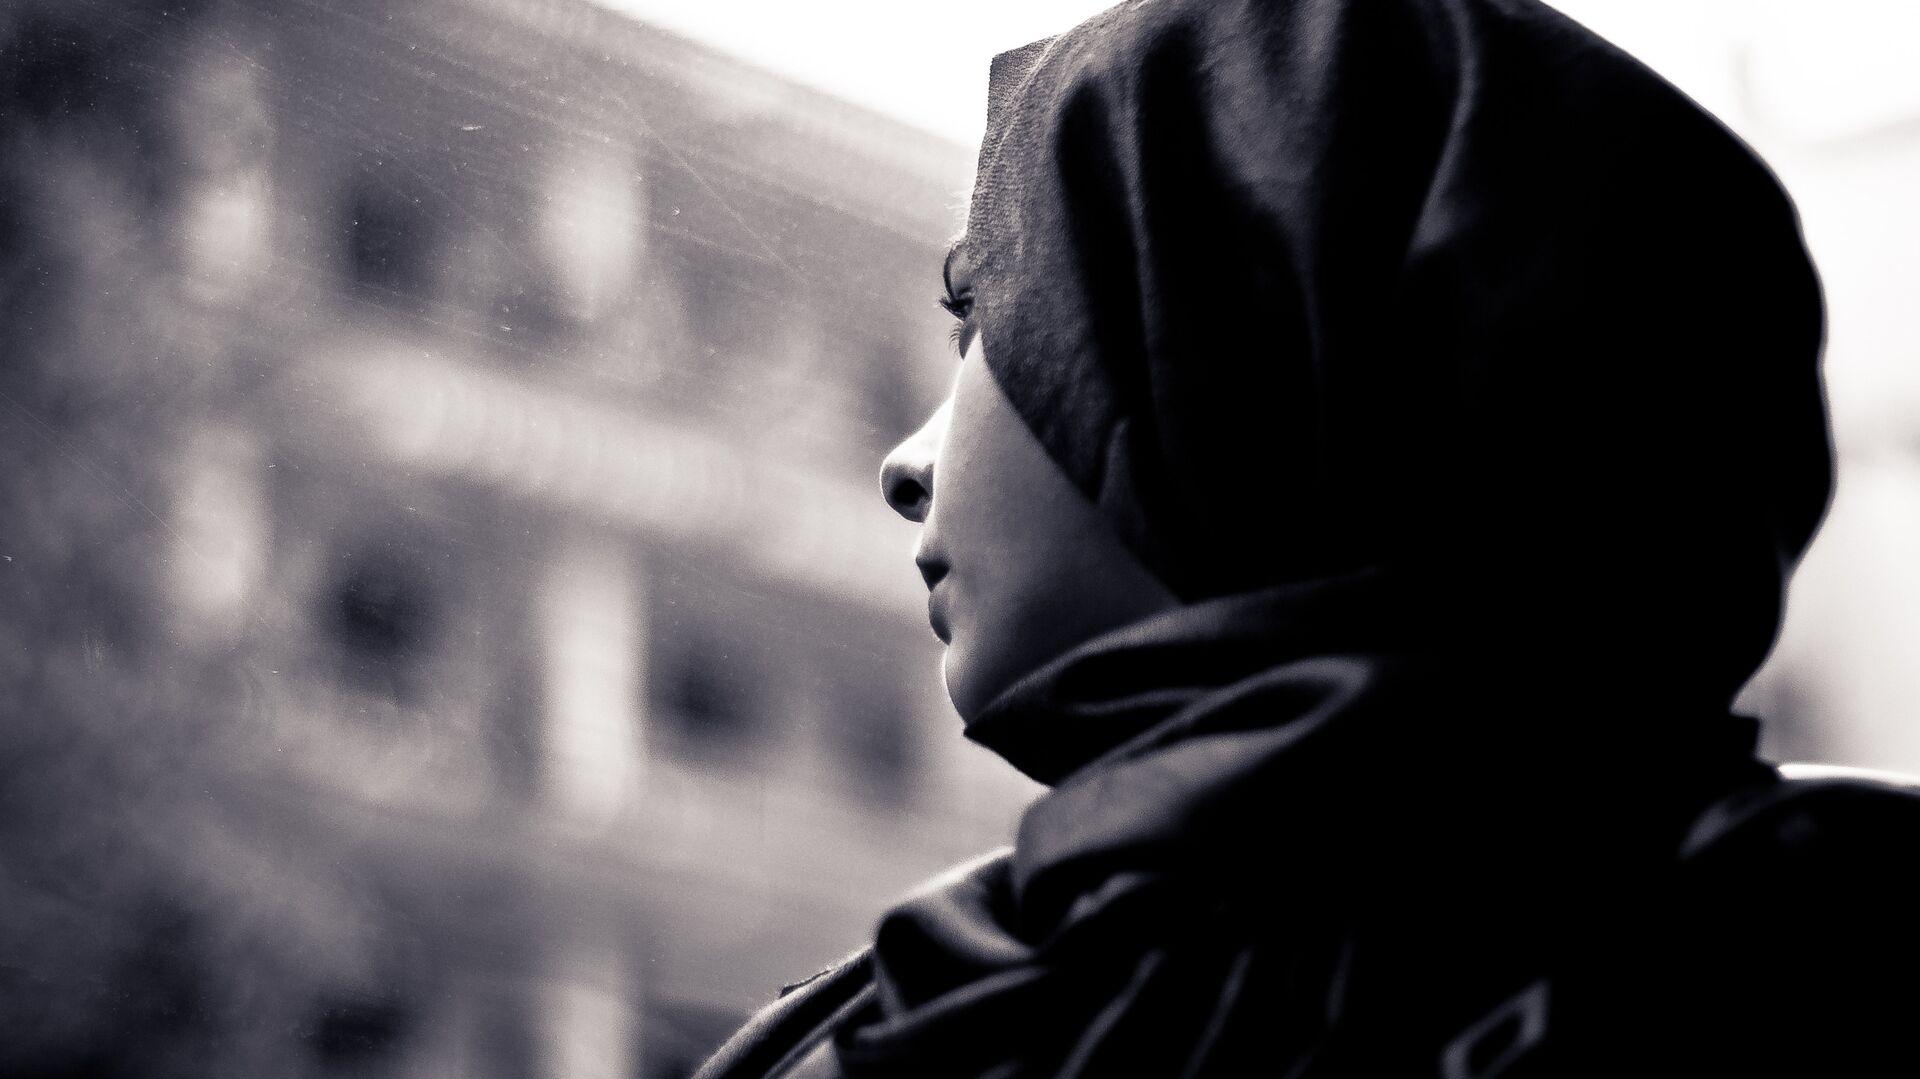 Una donna che indossa un hijab - Sputnik Italia, 1920, 18.07.2021